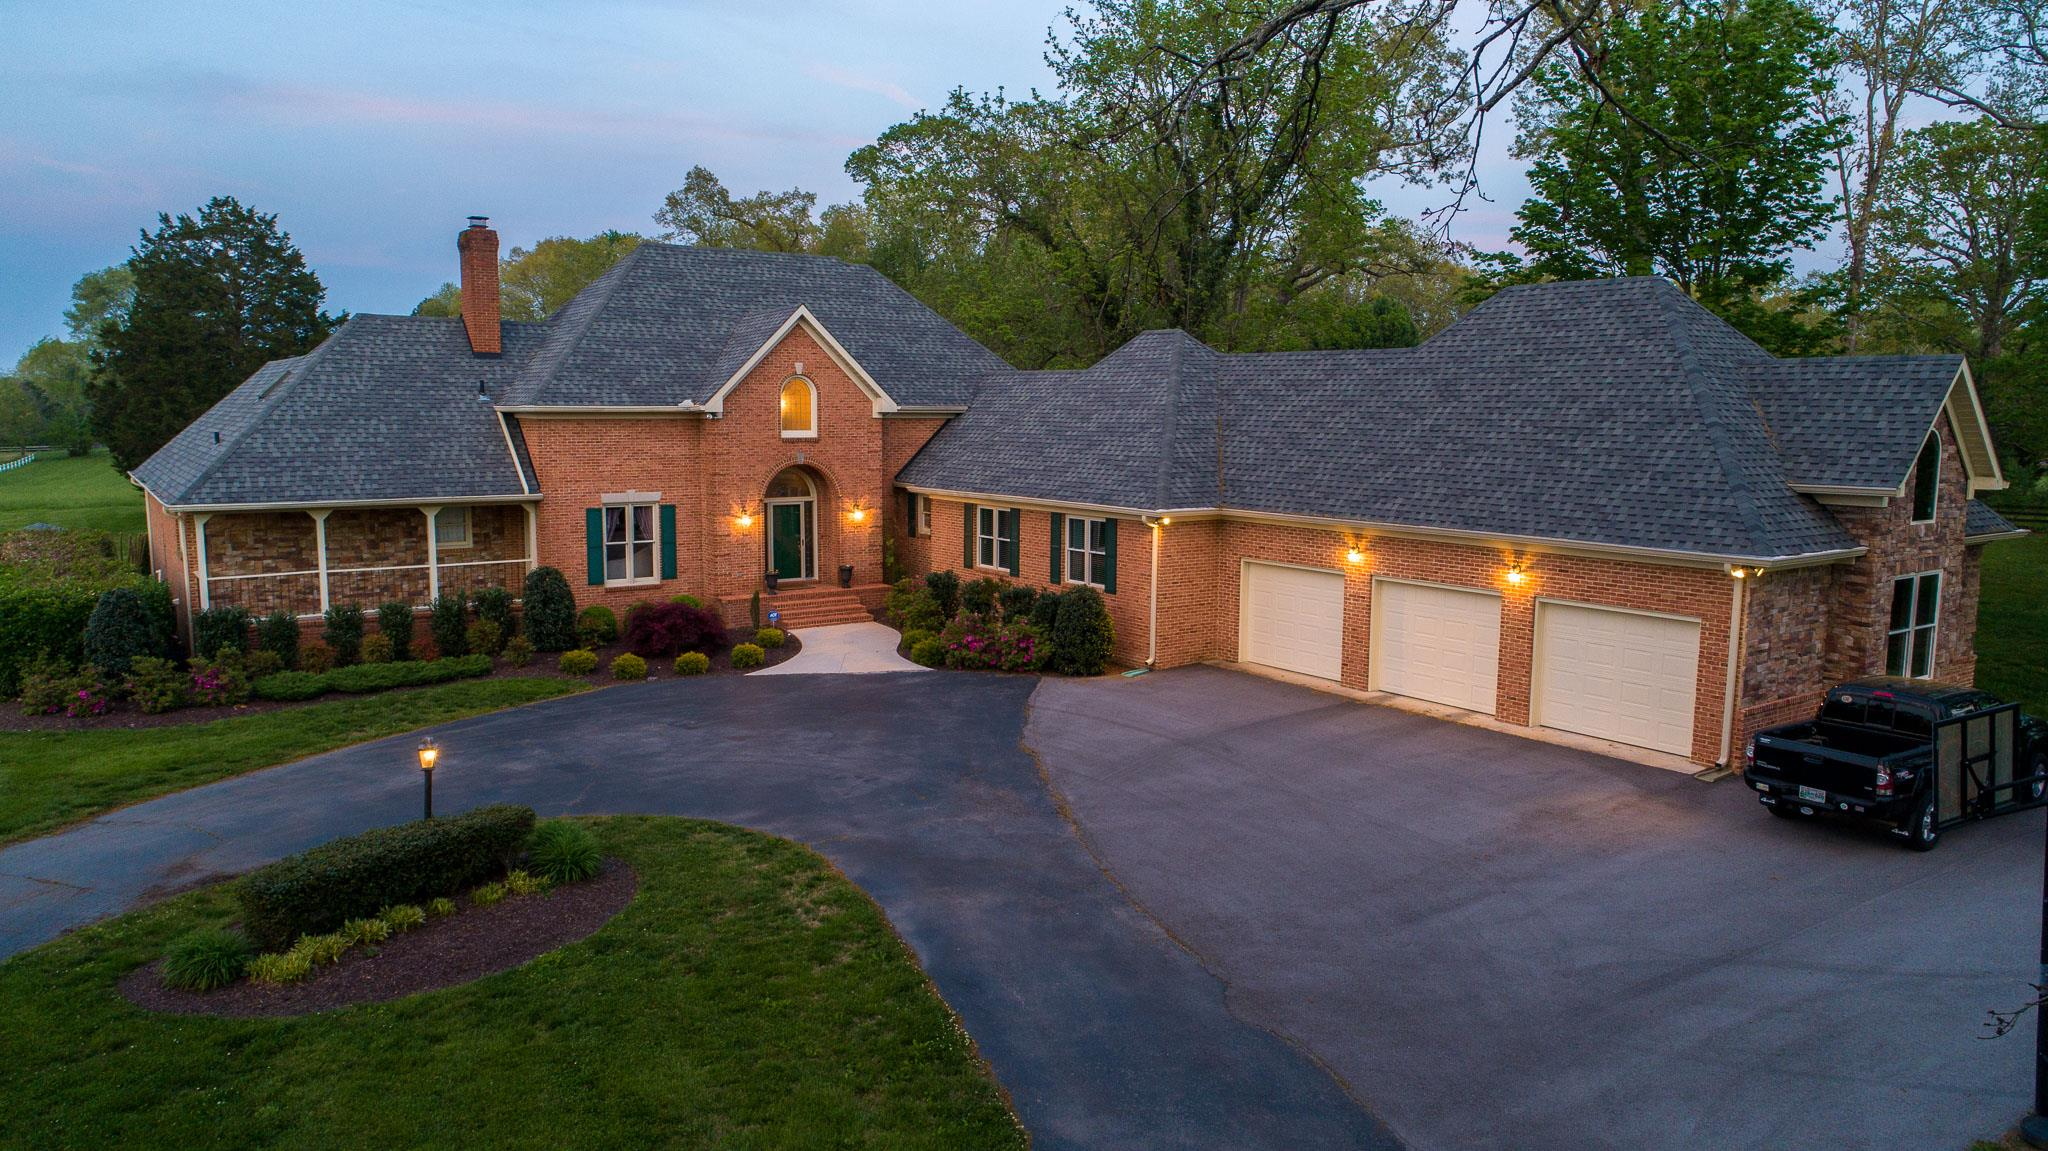 1808 OVOCA ROAD, Tullahoma, TN 37388 - Tullahoma, TN real estate listing